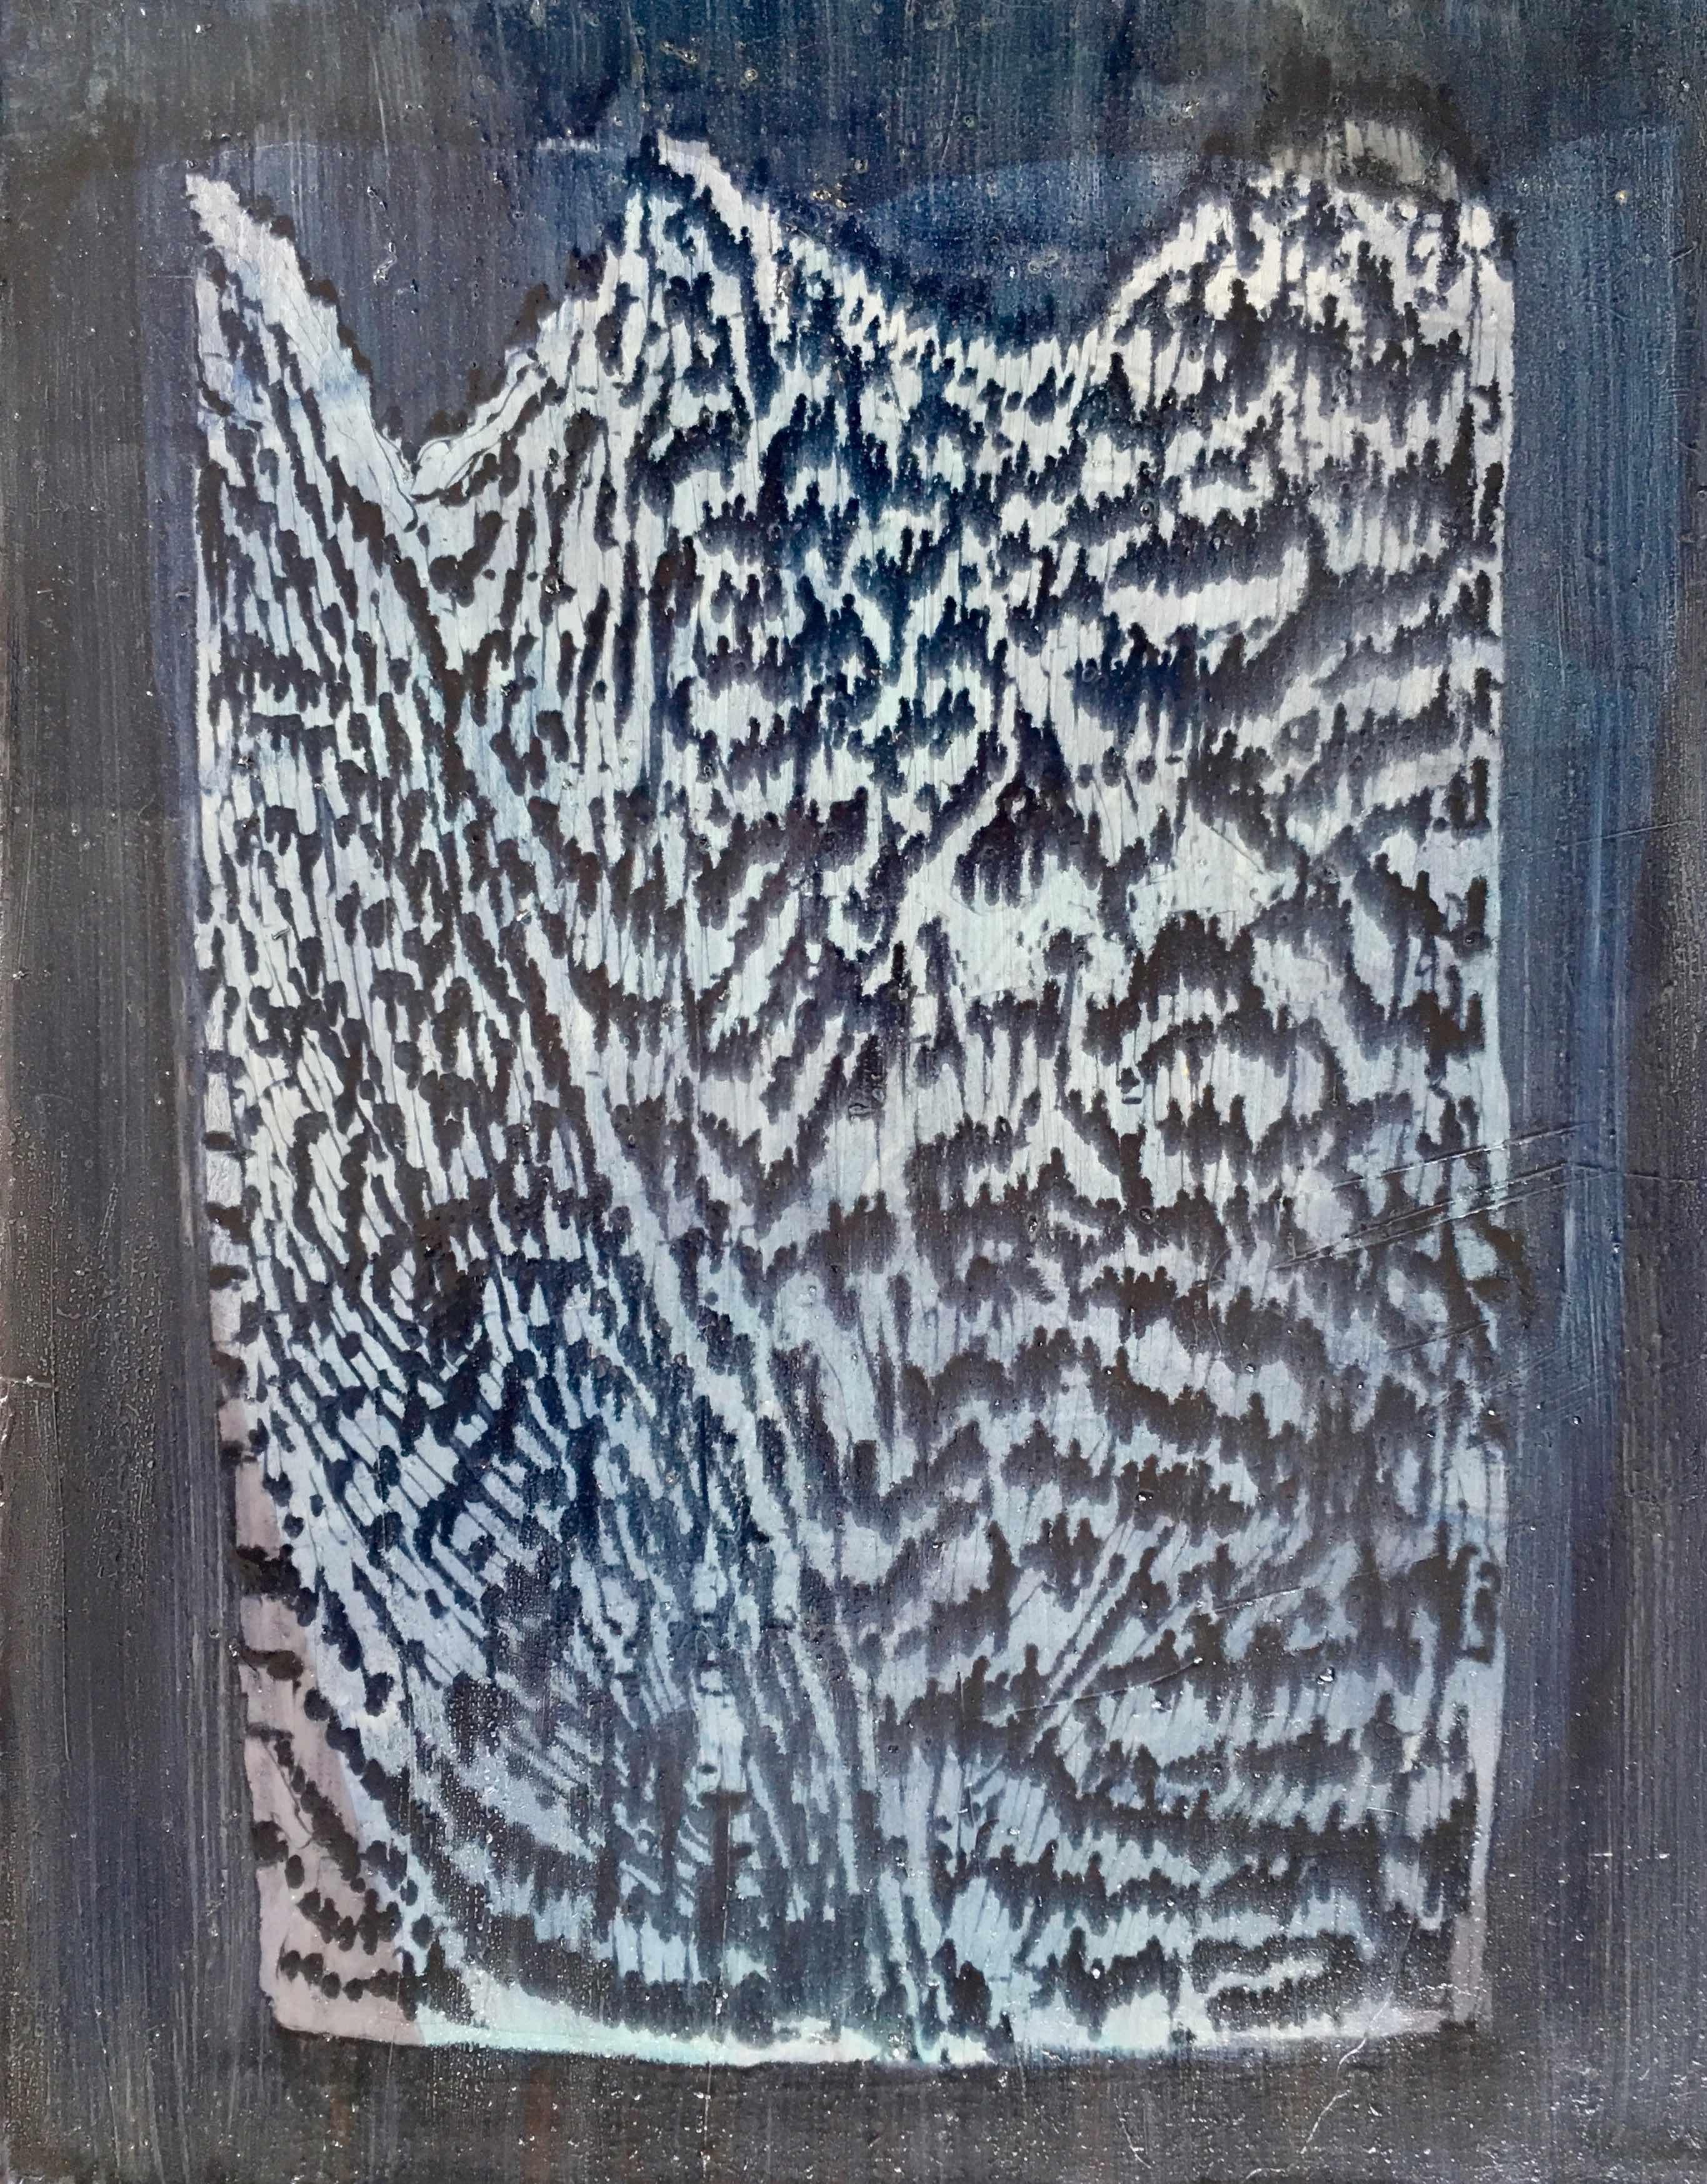 Plenk.Trapped 55x75cm, Öl auf Leinwand, 2018